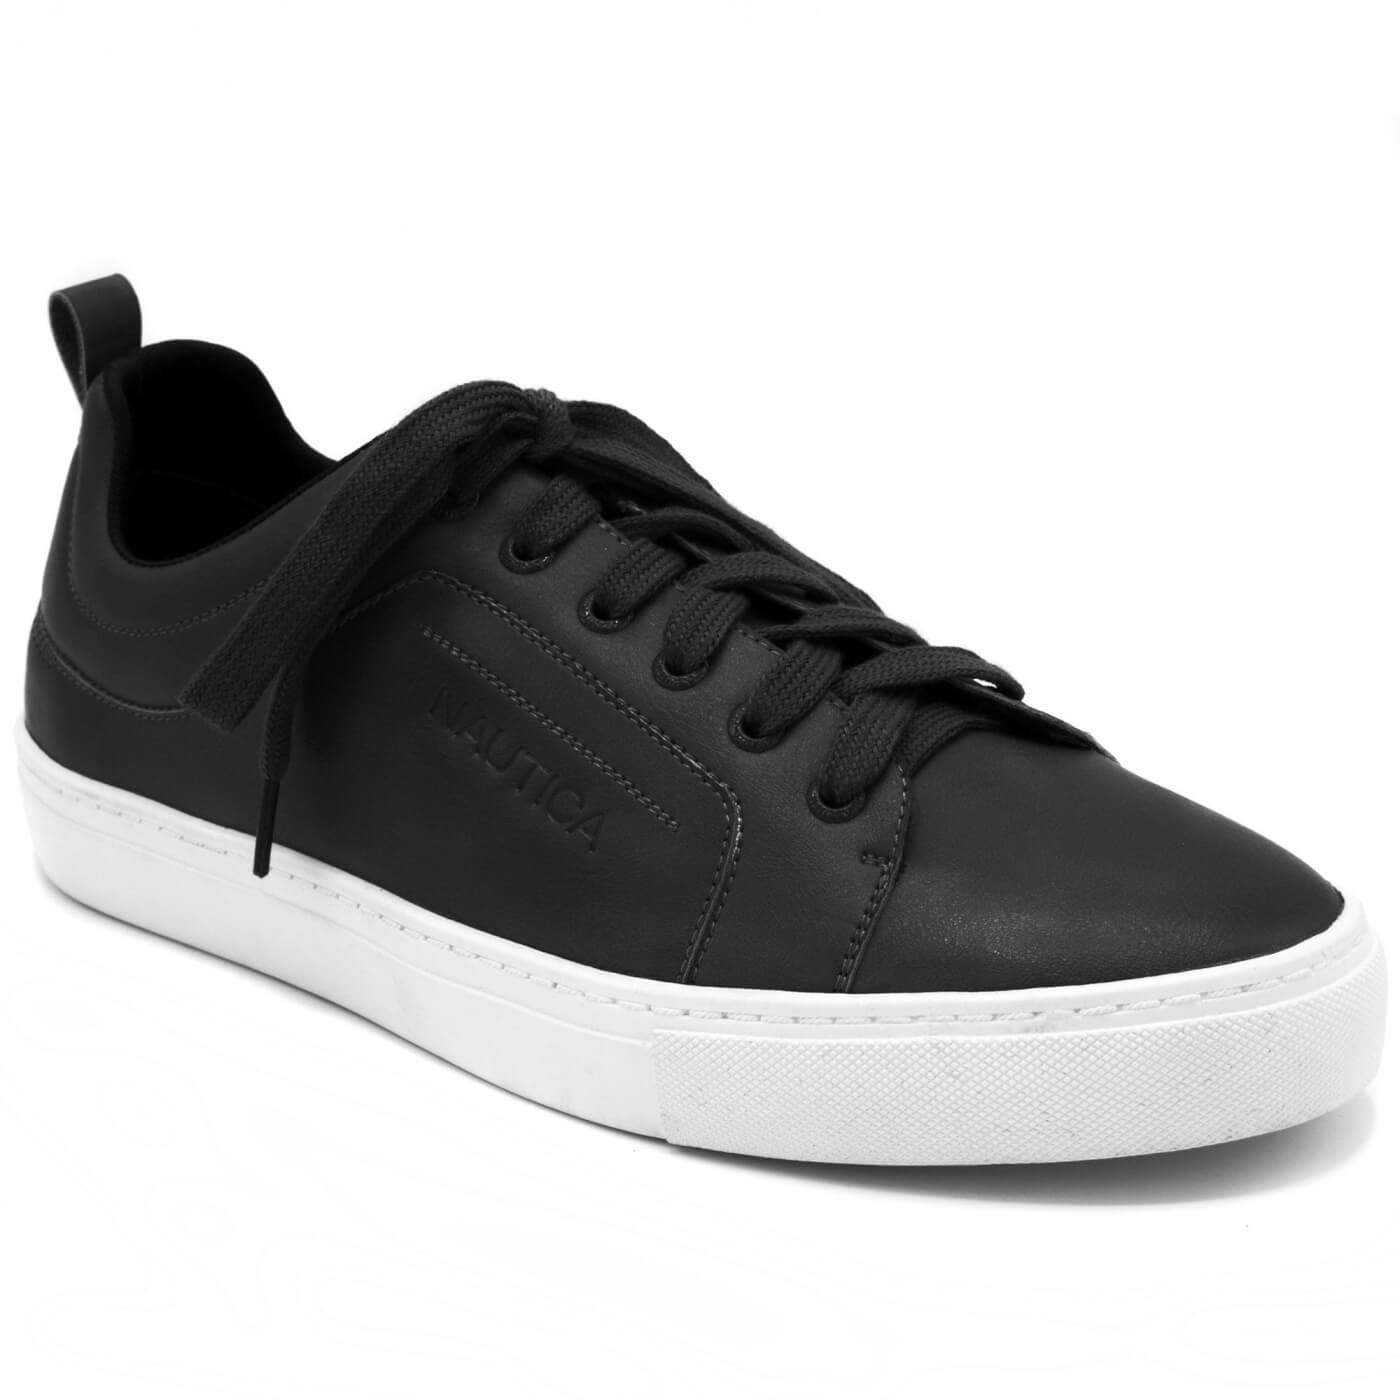 wholesale dealer a61f6 522ae Nautica Alphard Sneakers